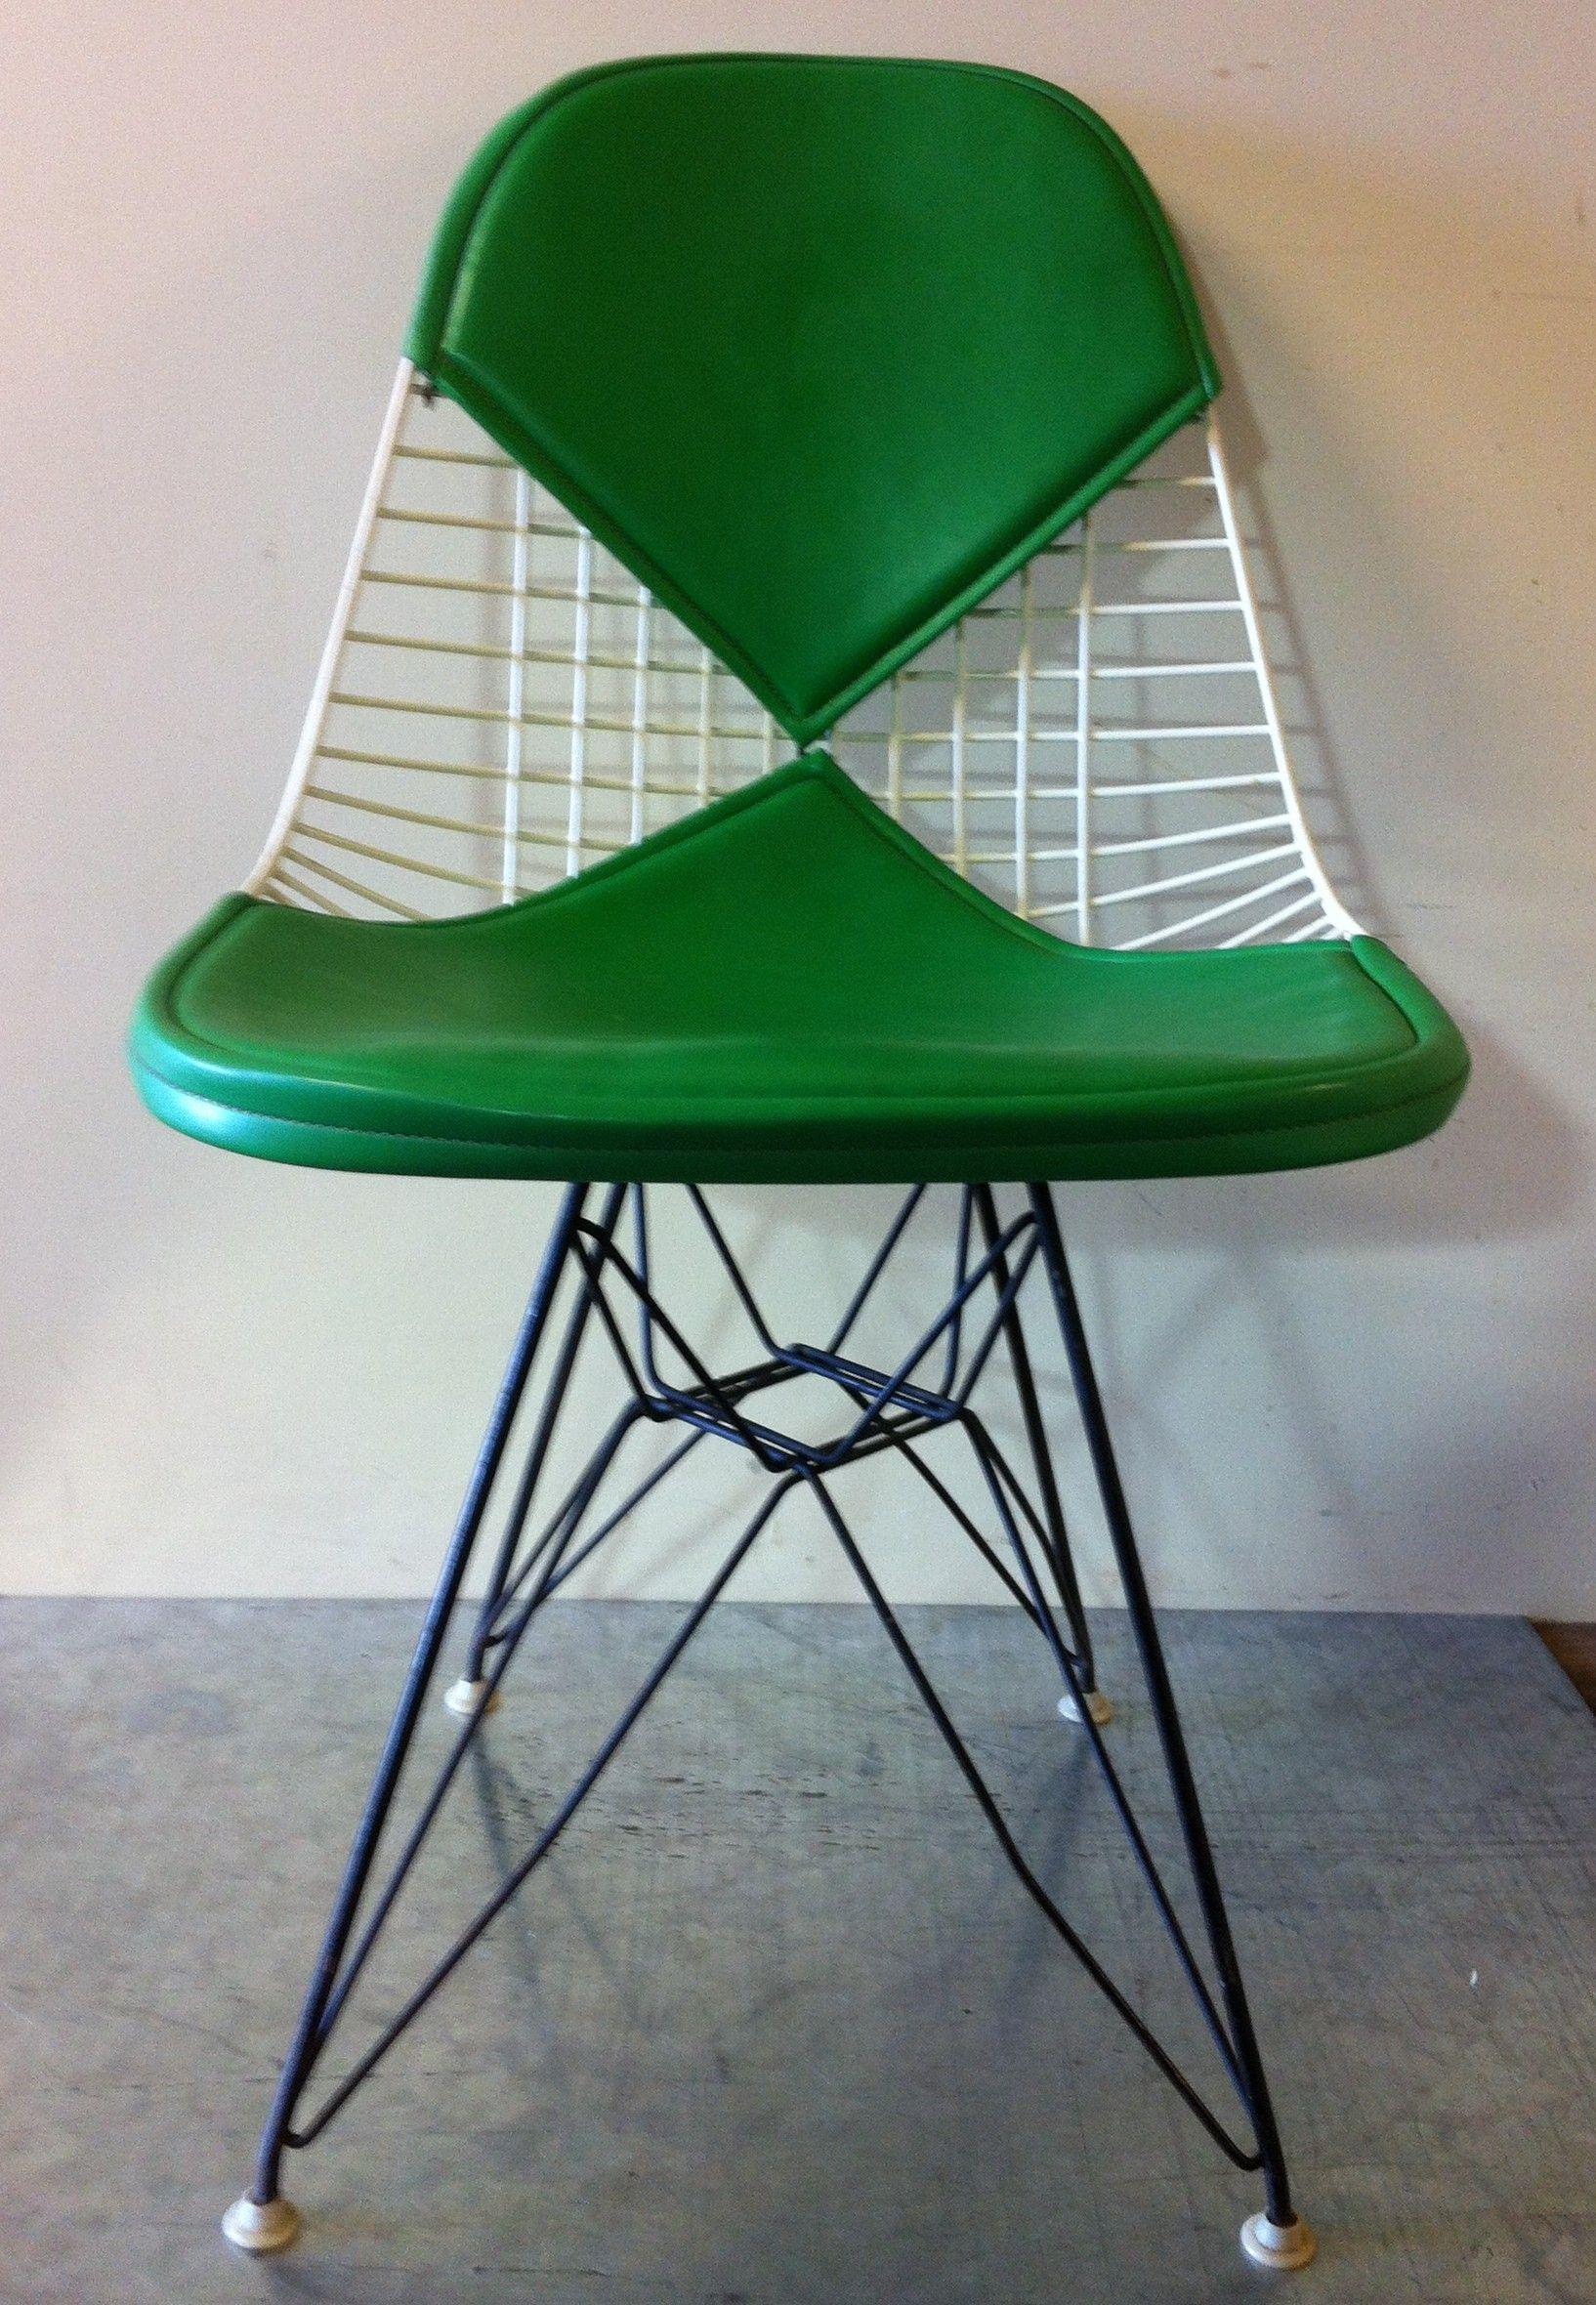 eames herman miller dkr chair 495 chicago http furnishly com